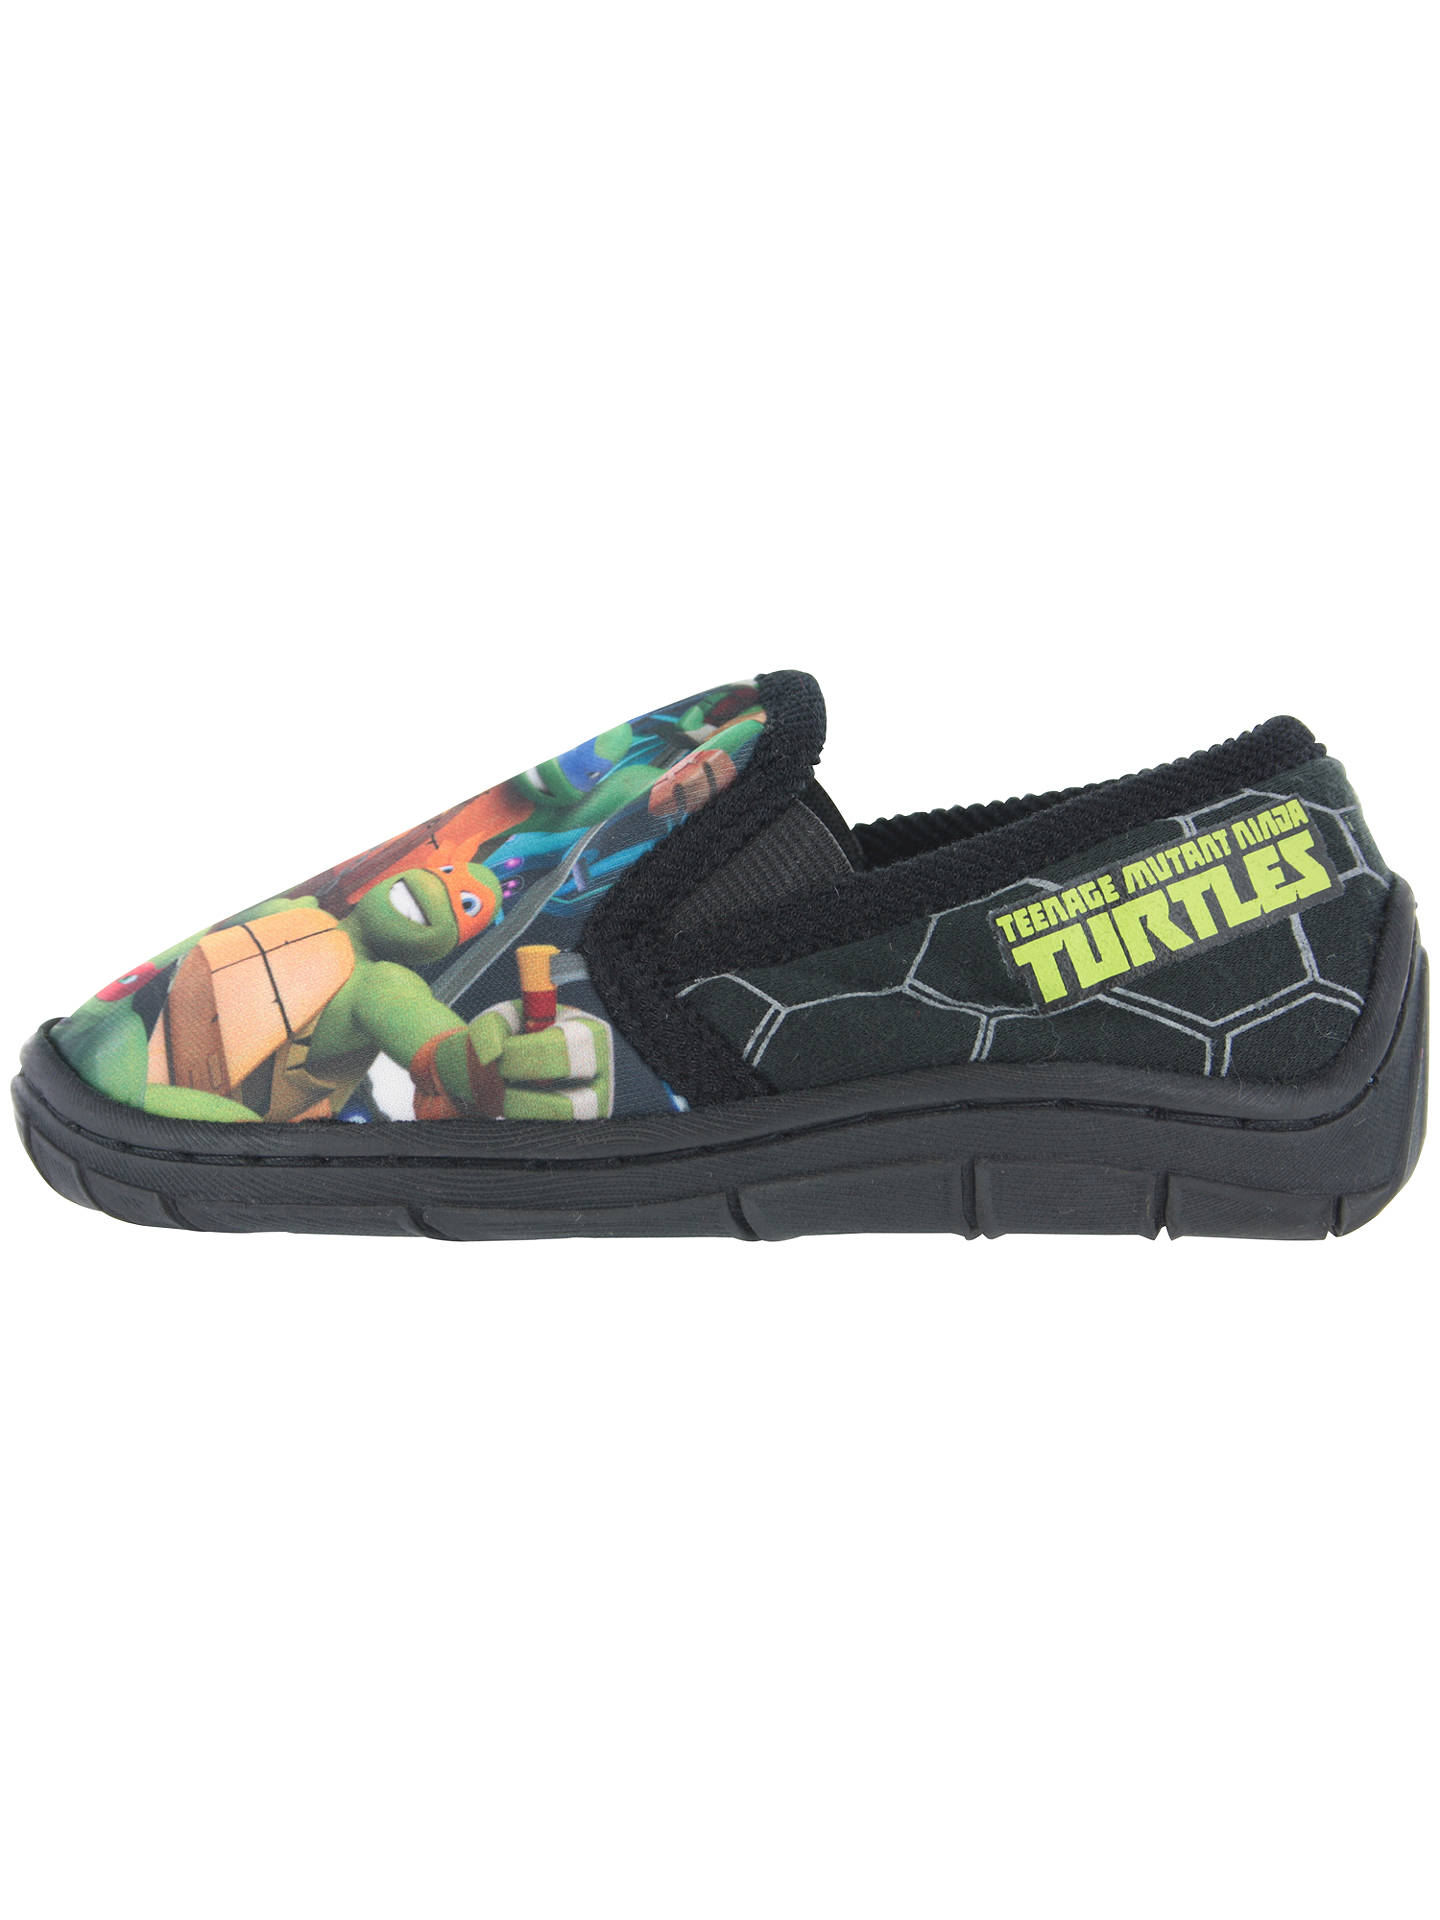 offer discounts best price uk cheap sale Teenage Mutant Ninja Turtles Baby Soft Grip Slippers, Black at ...